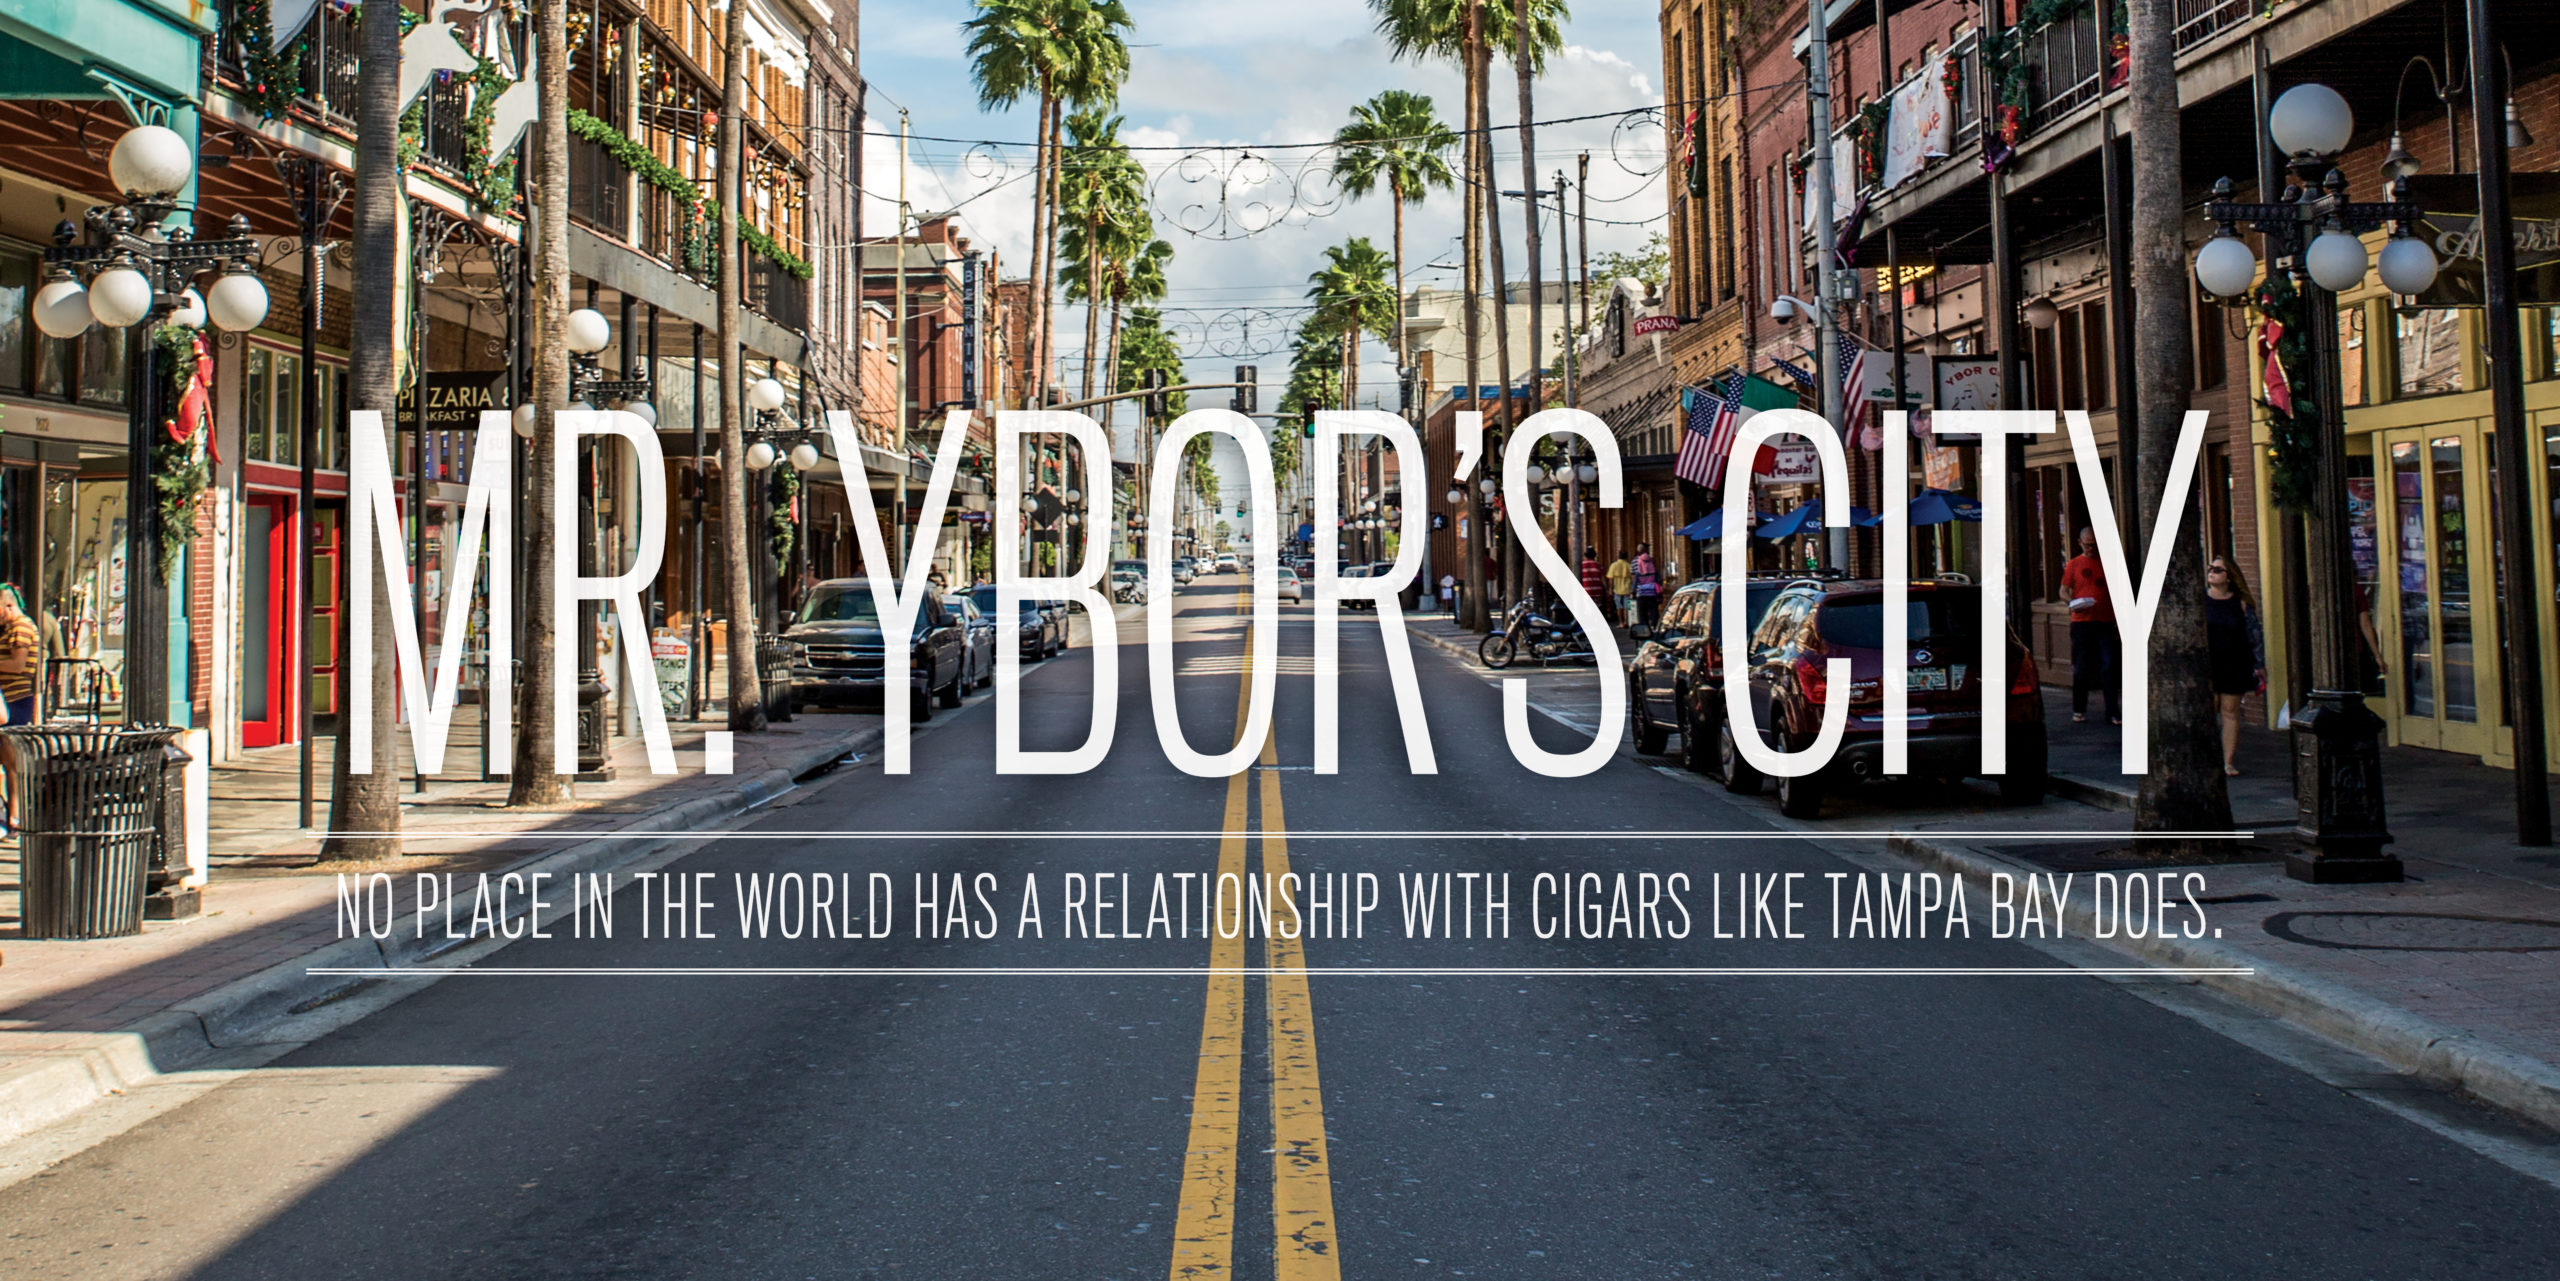 Mr. Ybor's City